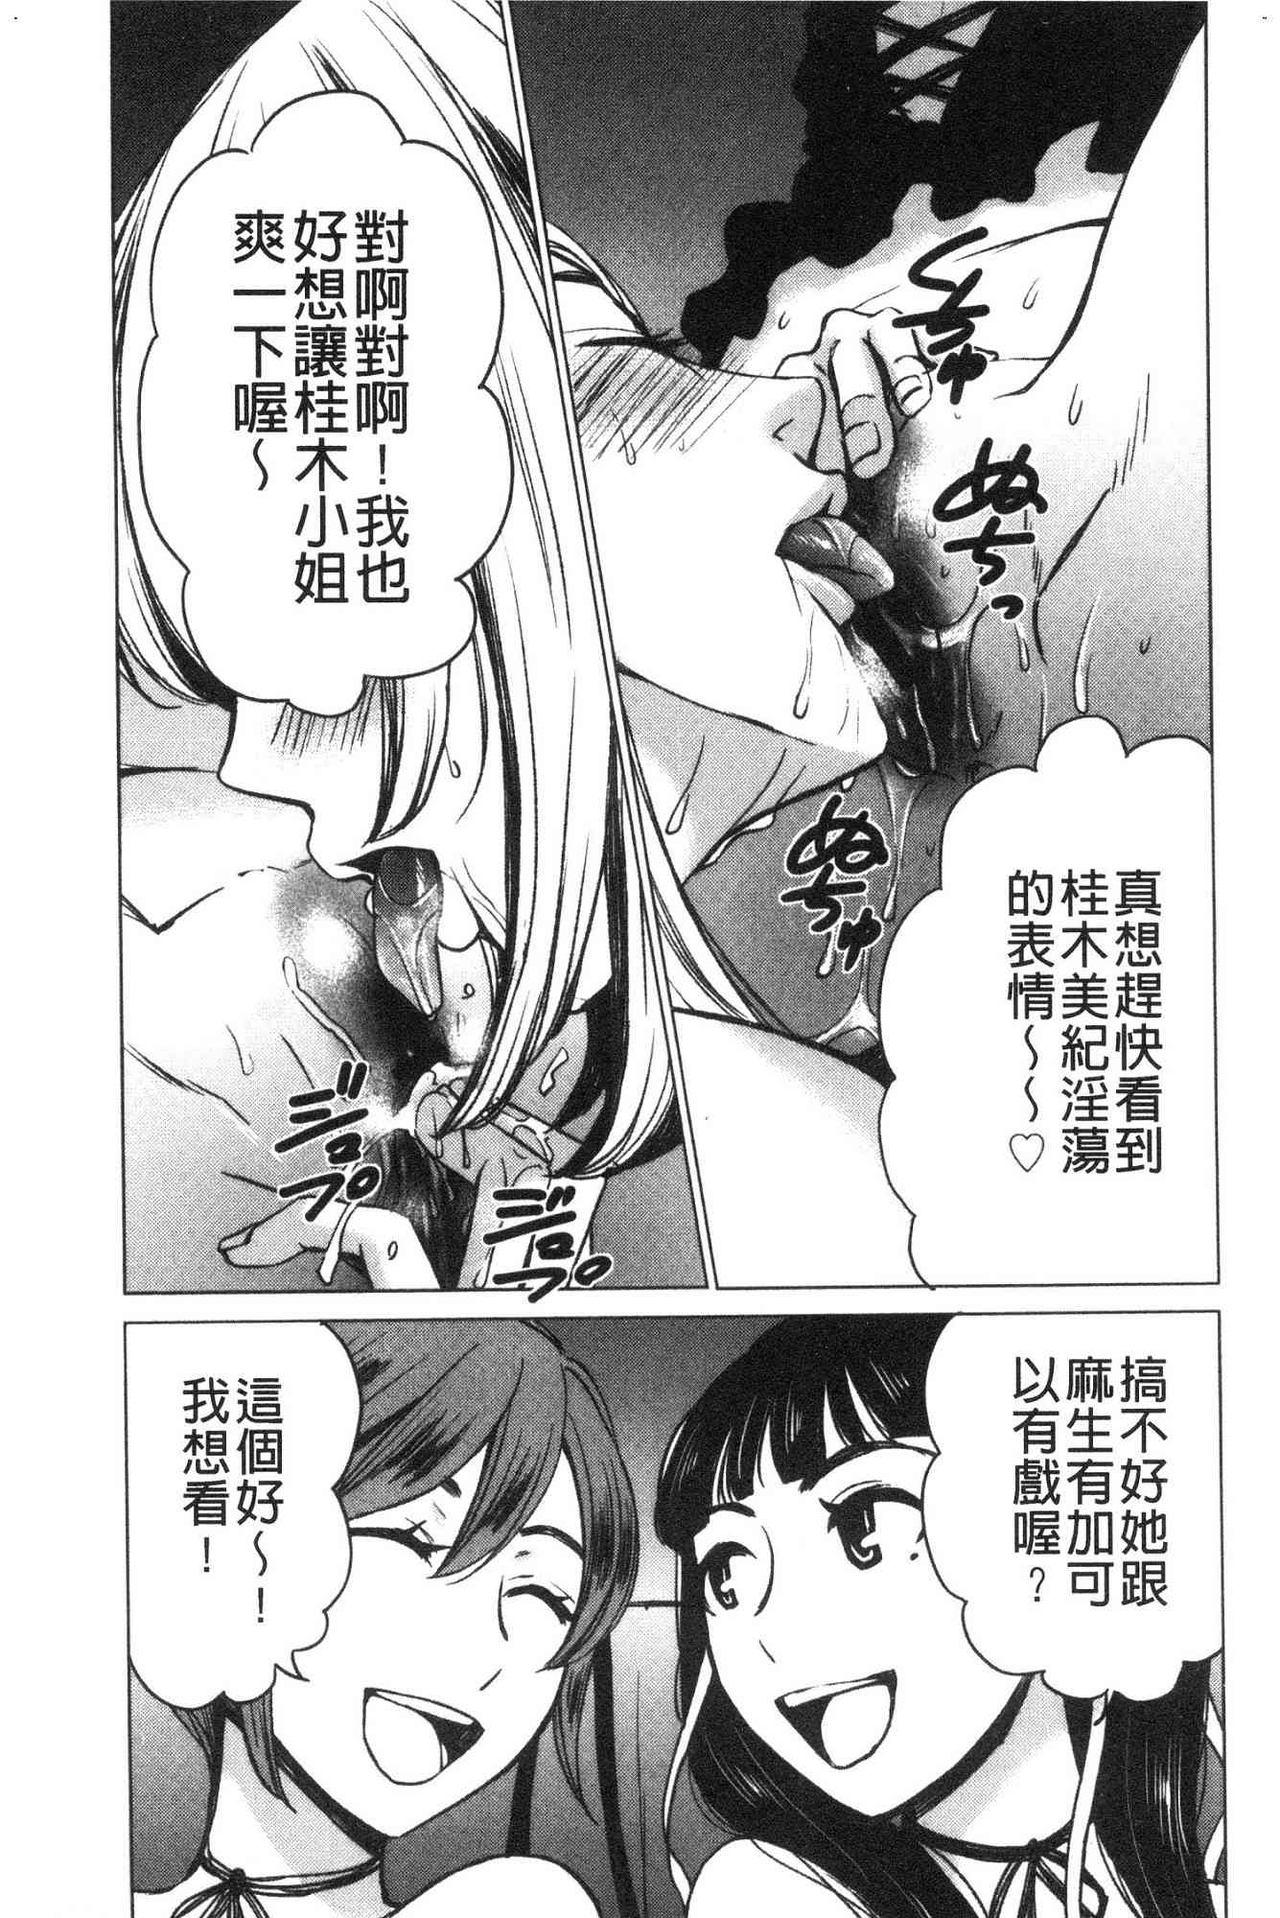 [Gotoh Akira]  21-ji no Onna ~Camera no Mae no Mesuinu~ 2 | 21時之女 ~鏡頭前的牝犬~ 2 [Chinese] 156